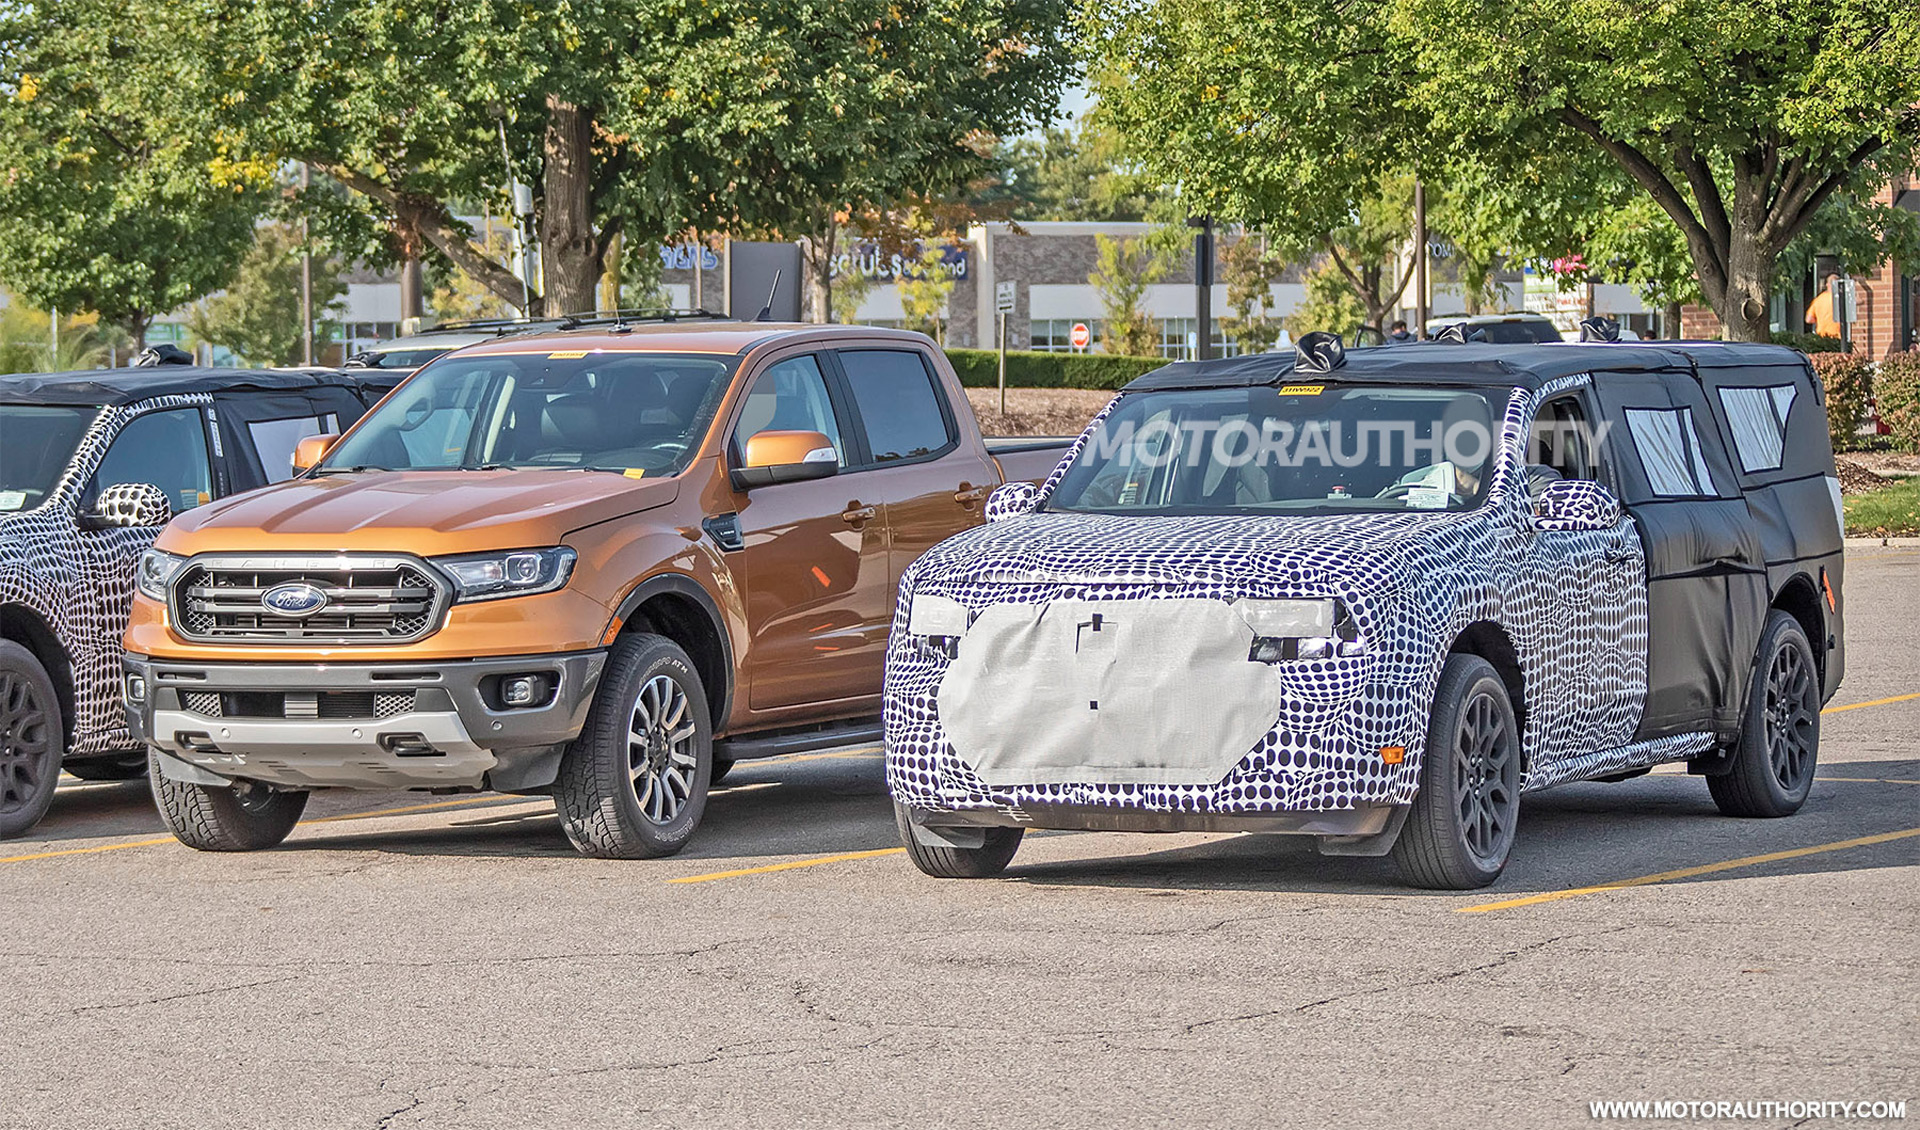 2022 Ford Maverick Leaked Photo Reveals Very Bold Design ...